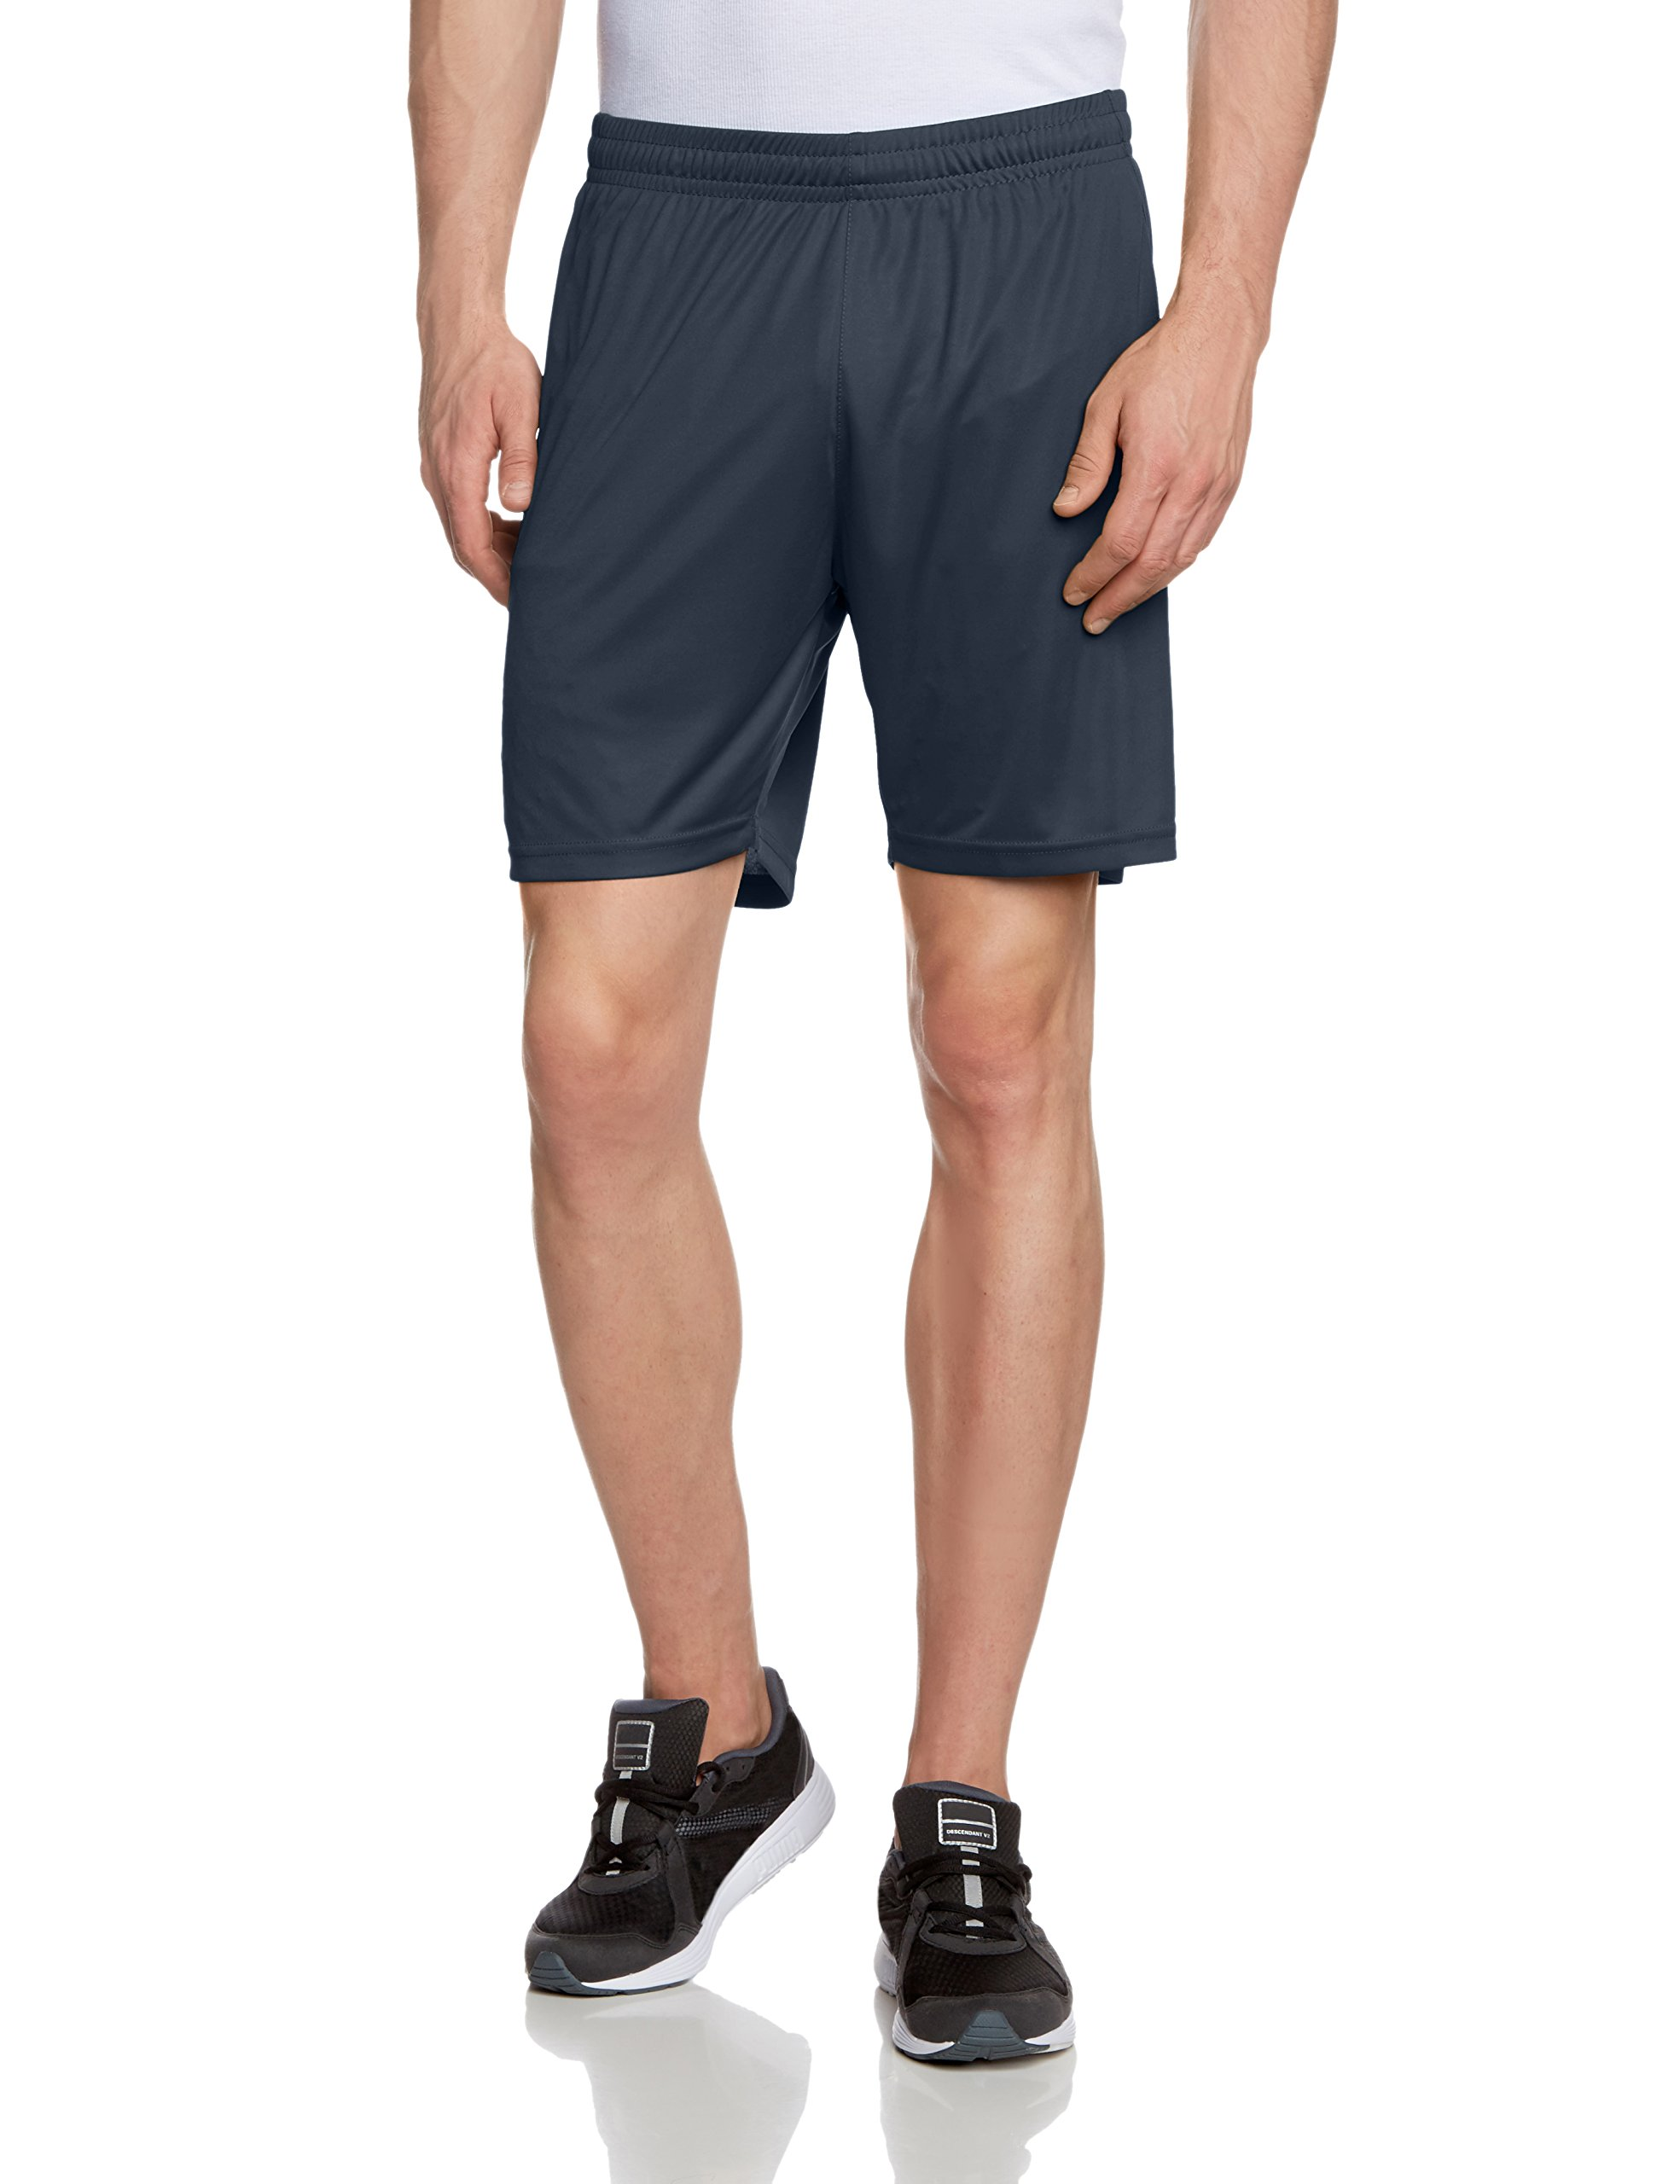 erima, Pantaloni corti Uomo Rio 2.0 con mutanda interna, Blu (new navy), XL